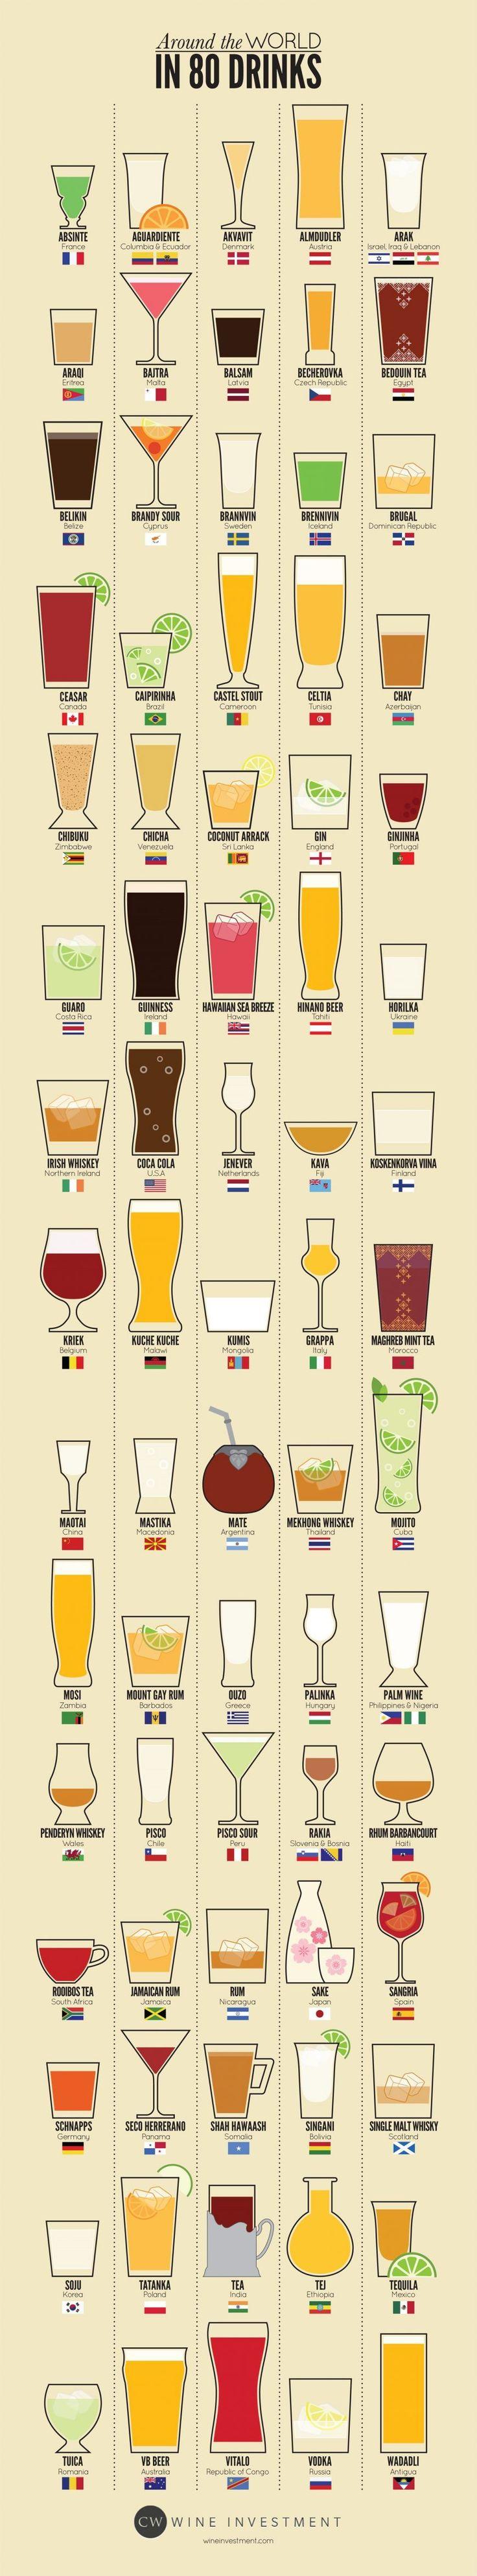 80 bauturi din jurul lumii. Ce sa bei in fiecare tara pe care o vizitezi?